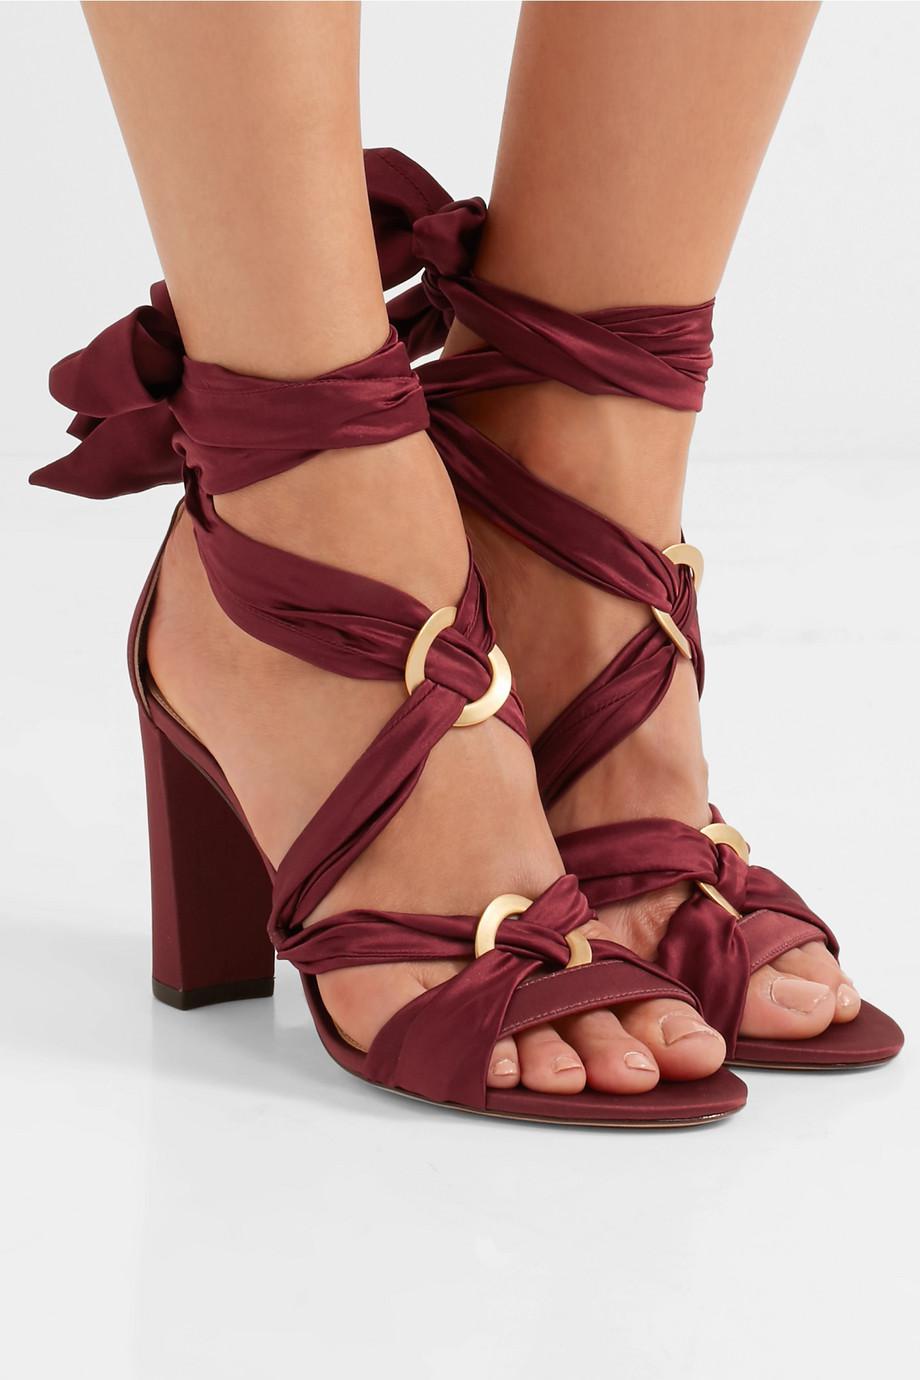 Lyst Alexandre Birman Alessa Lace Up Satin Sandals In Red Clarette Wedges Cordelia Black Gallery